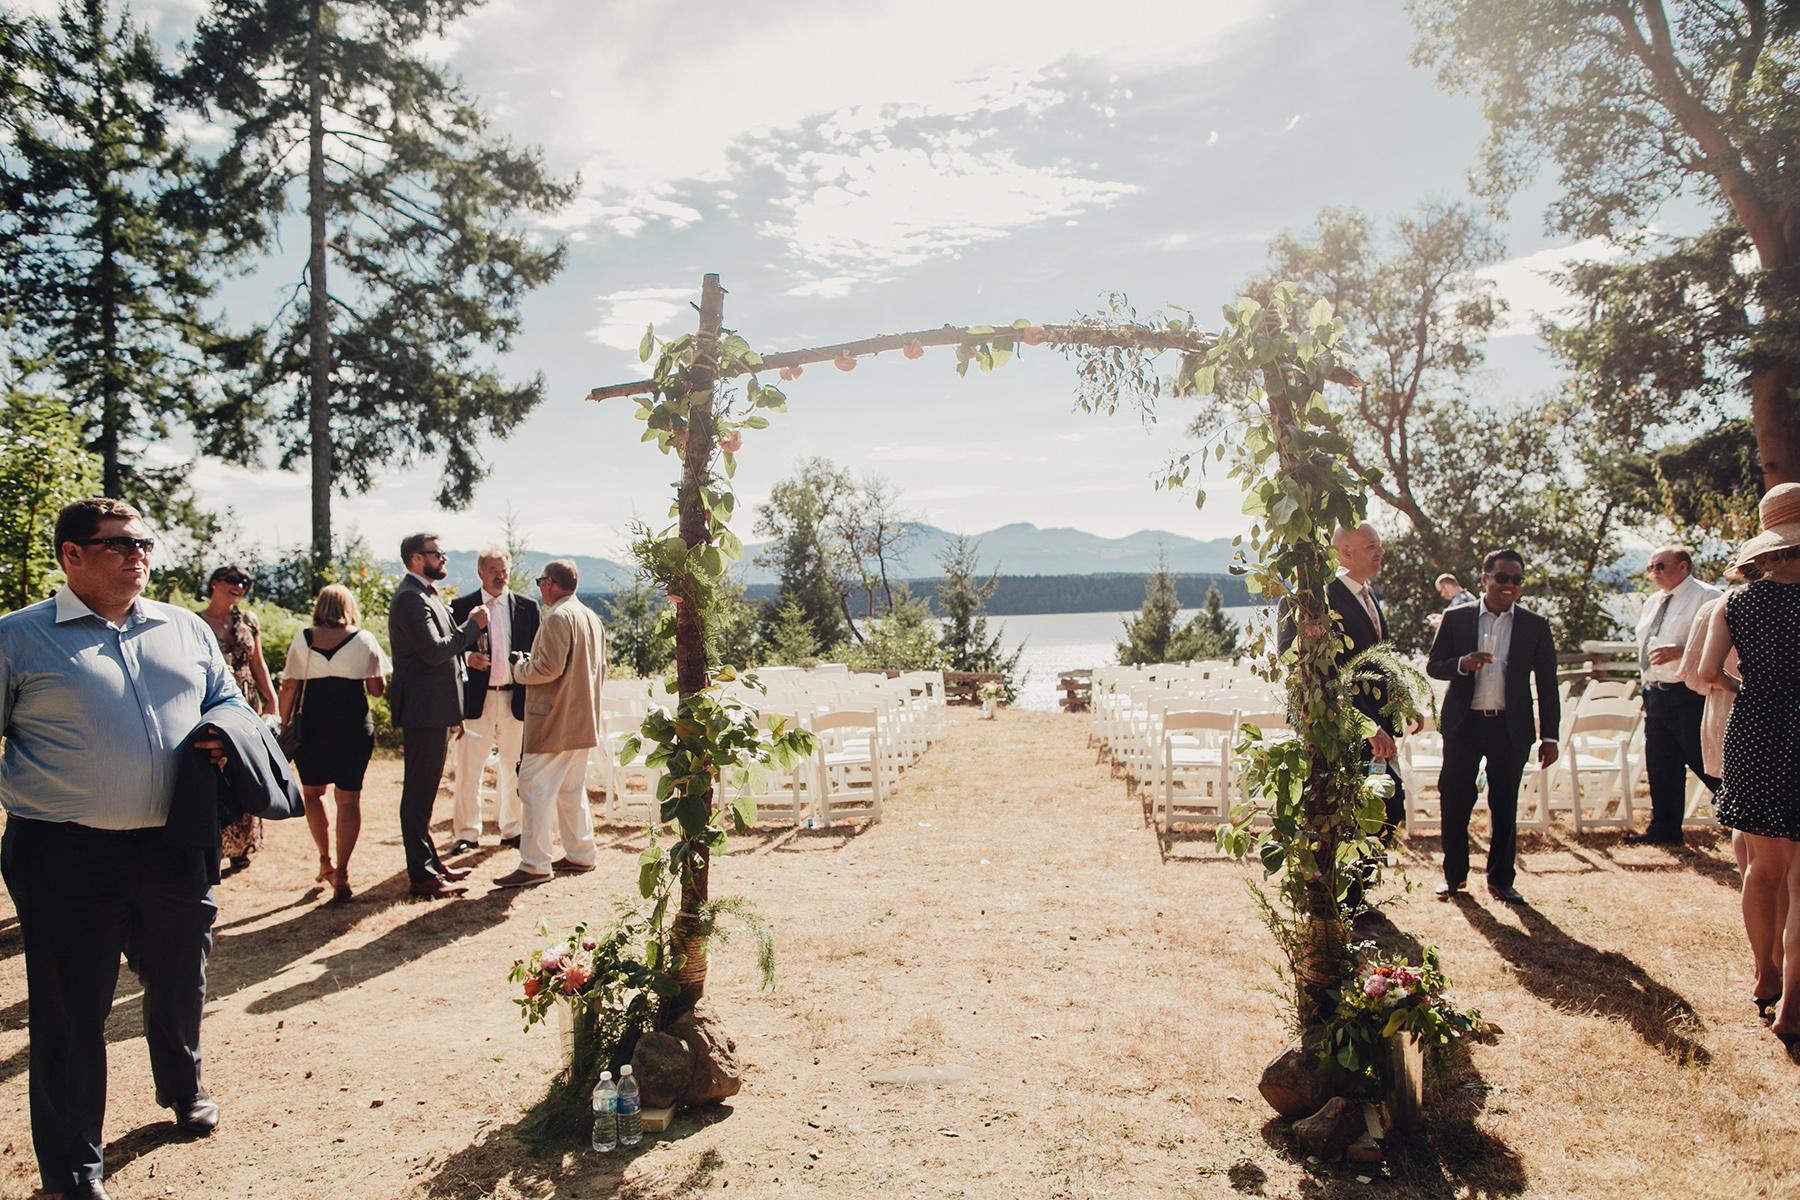 bodega-ridge-wedding-photos-0082.jpg